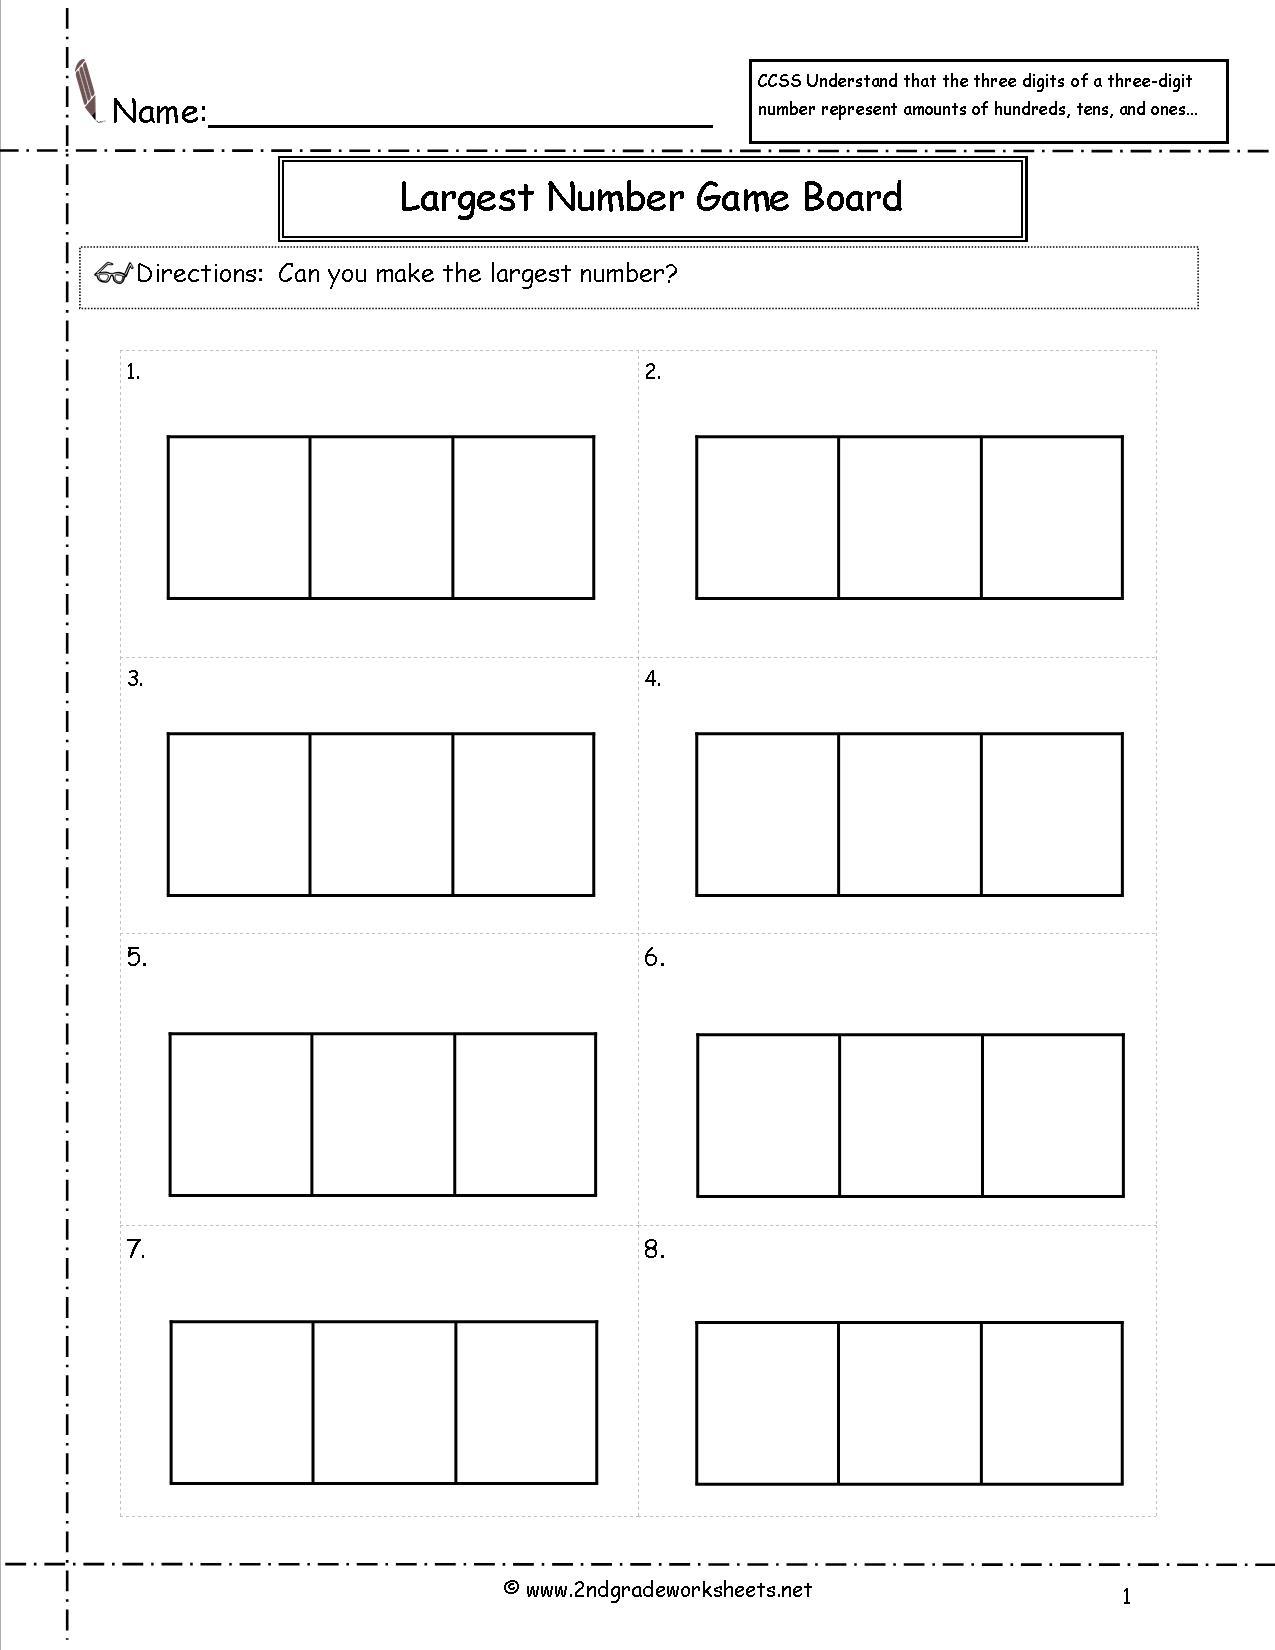 Print 2nd Grade Math Worksheet Place Value